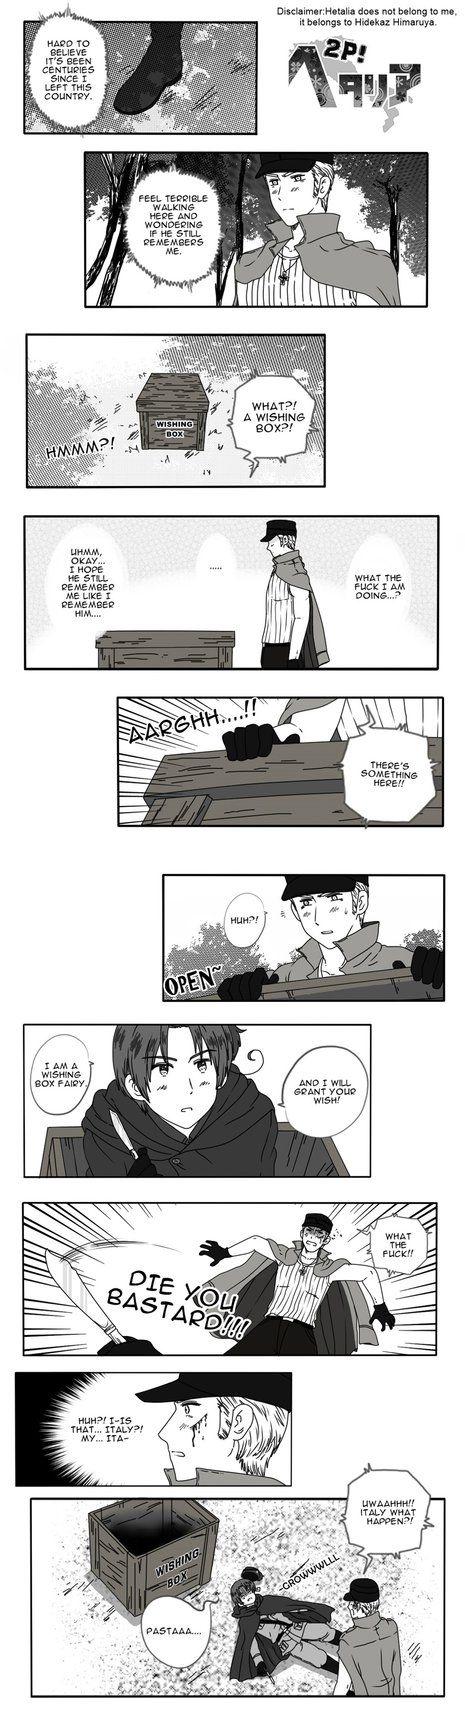 2P! Hetalia manga by SUN0627.deviantart.com on @DeviantArt